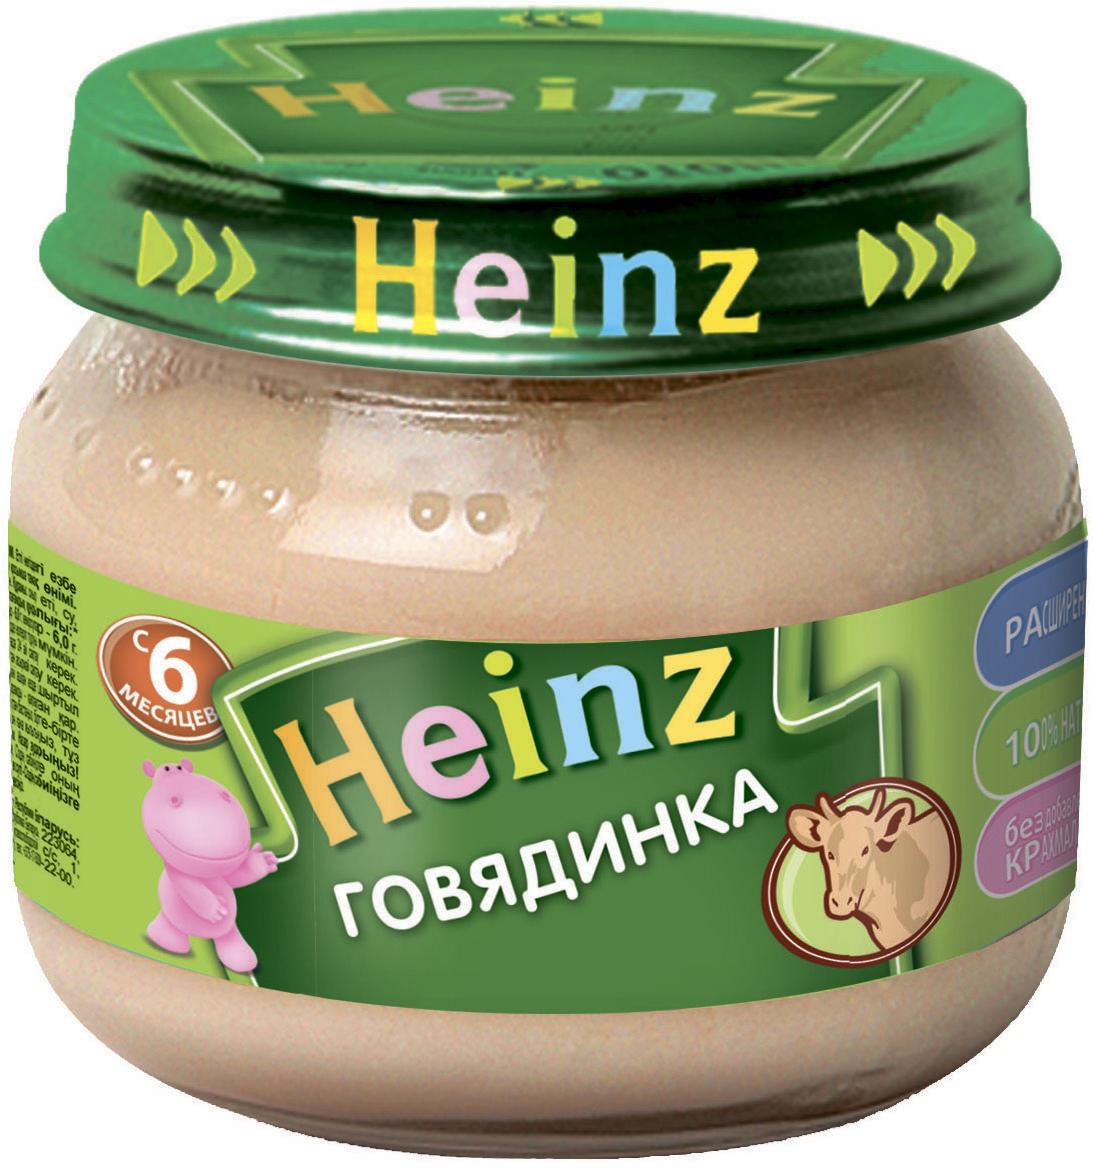 Мясное Heinz Heinz Говядинка (с 6 месяцев) 80 г karl heinz bohle dresden in farbe